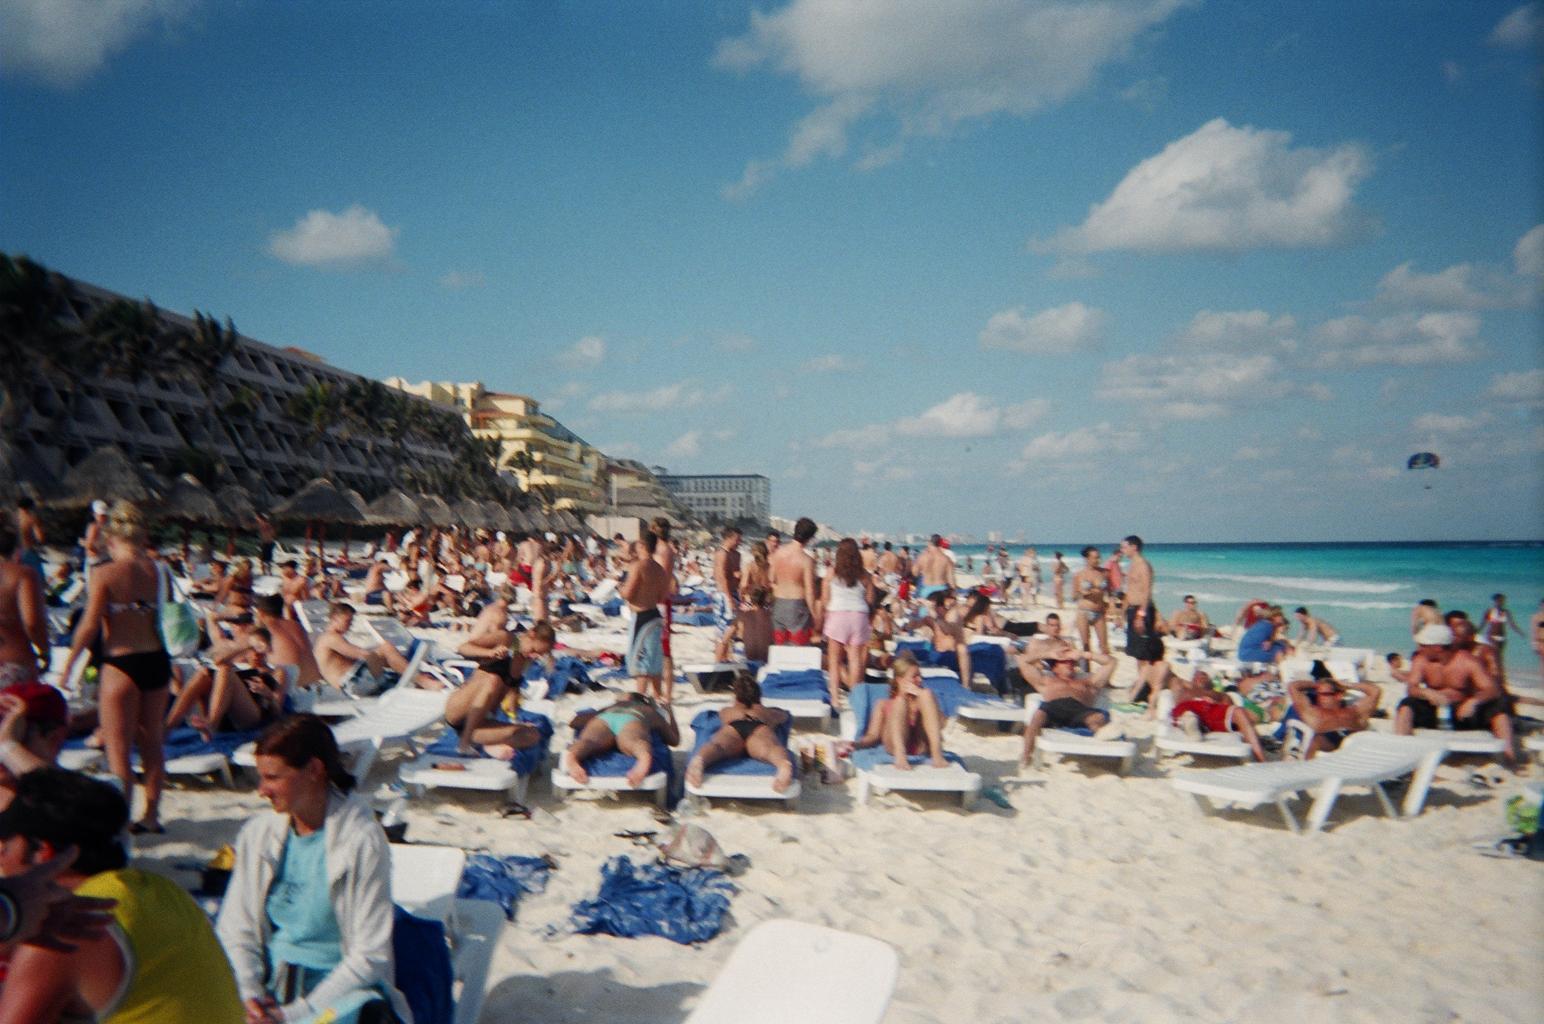 Bikini destinations cancun really. All